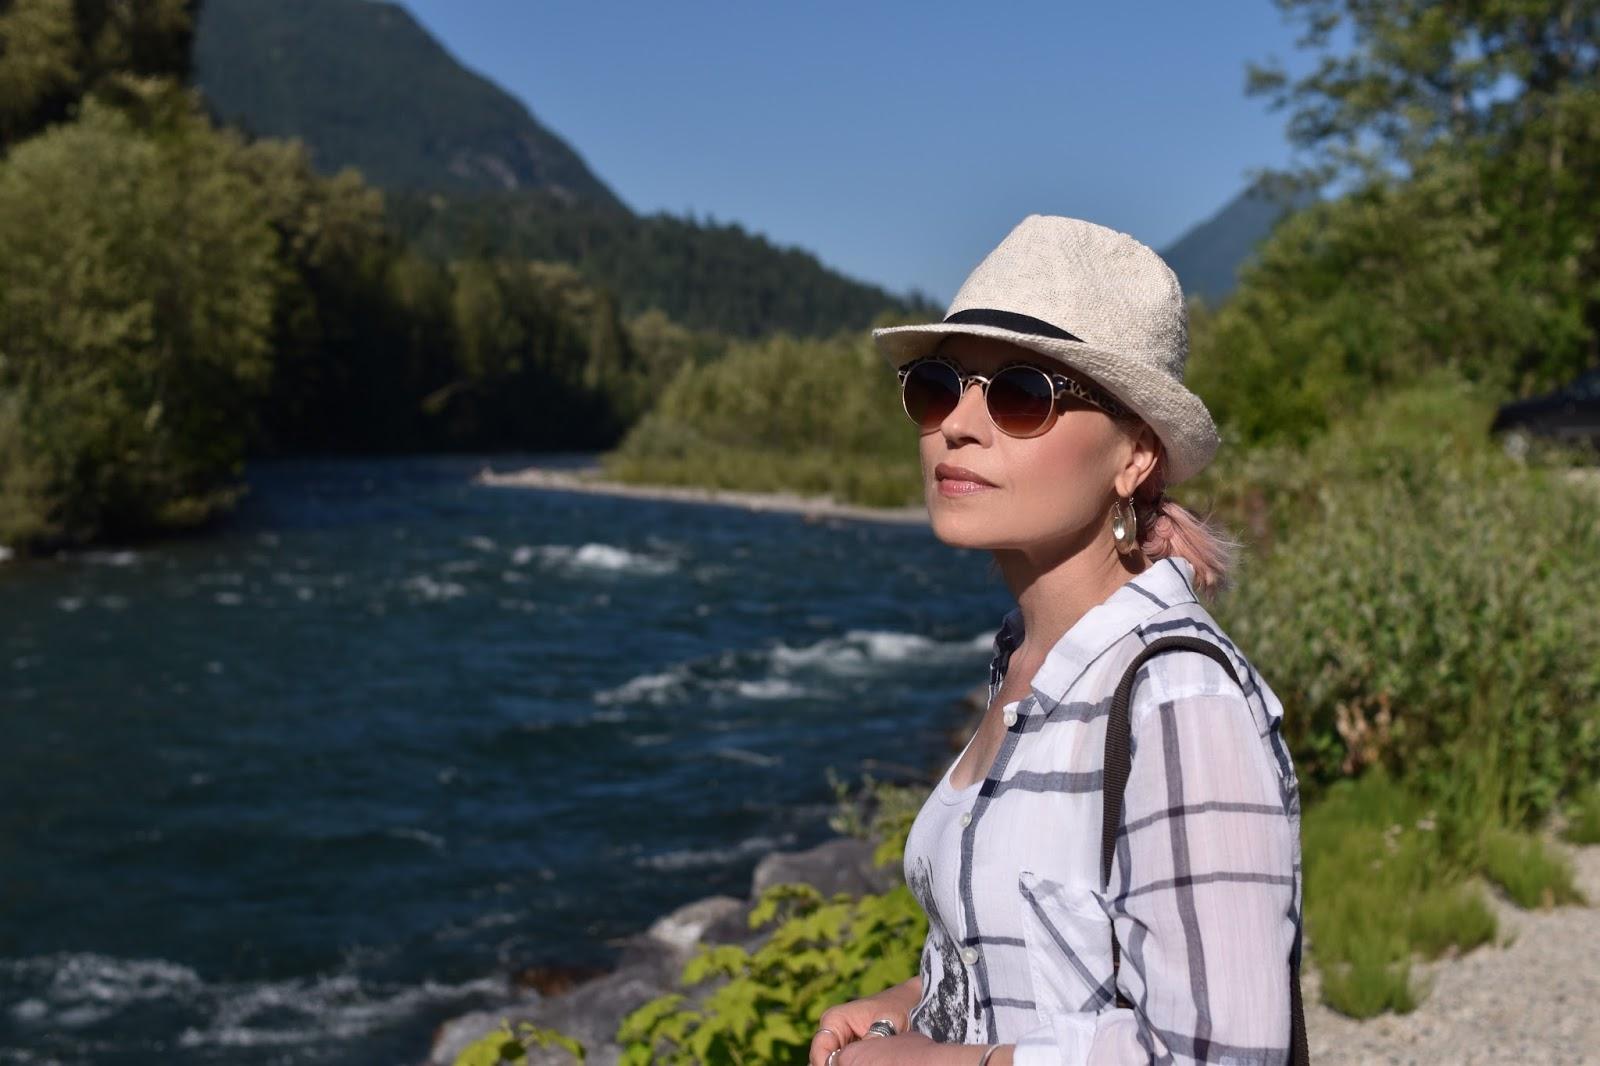 Monika Faulkner personal style inspiration - plaid shirt, straw fedora, Nanette sunglasses